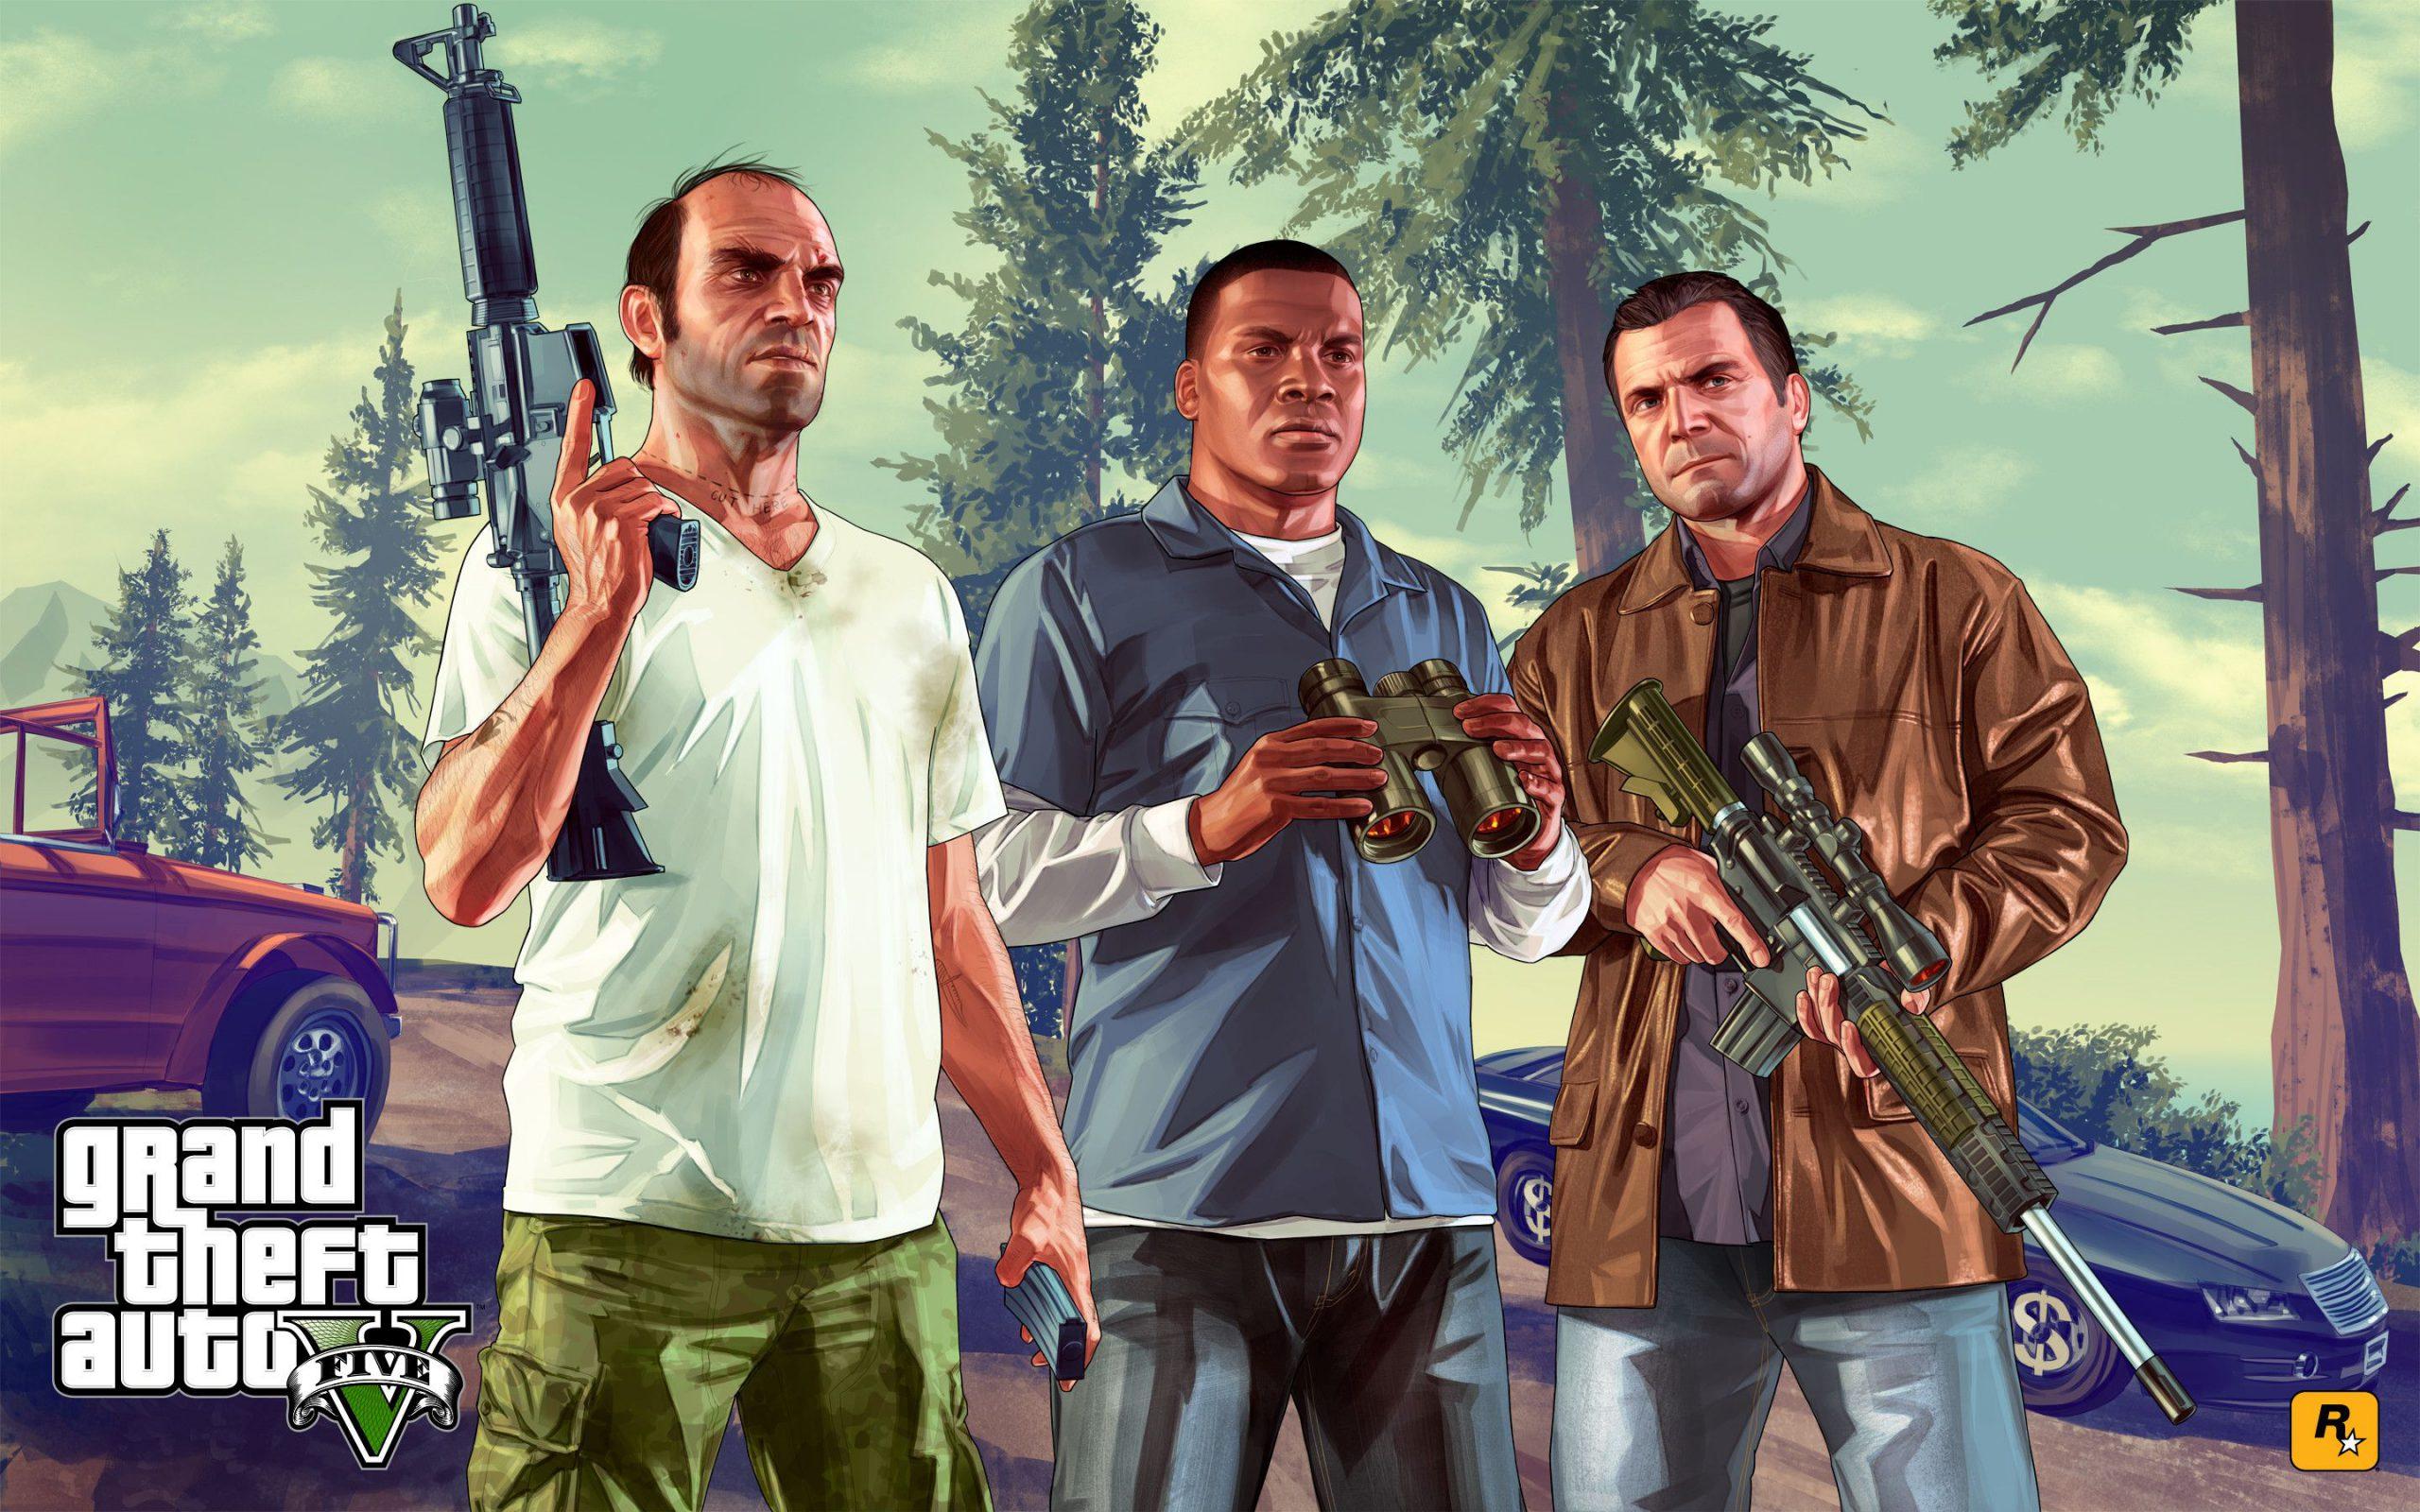 TOP 10 GTA V wallpapers